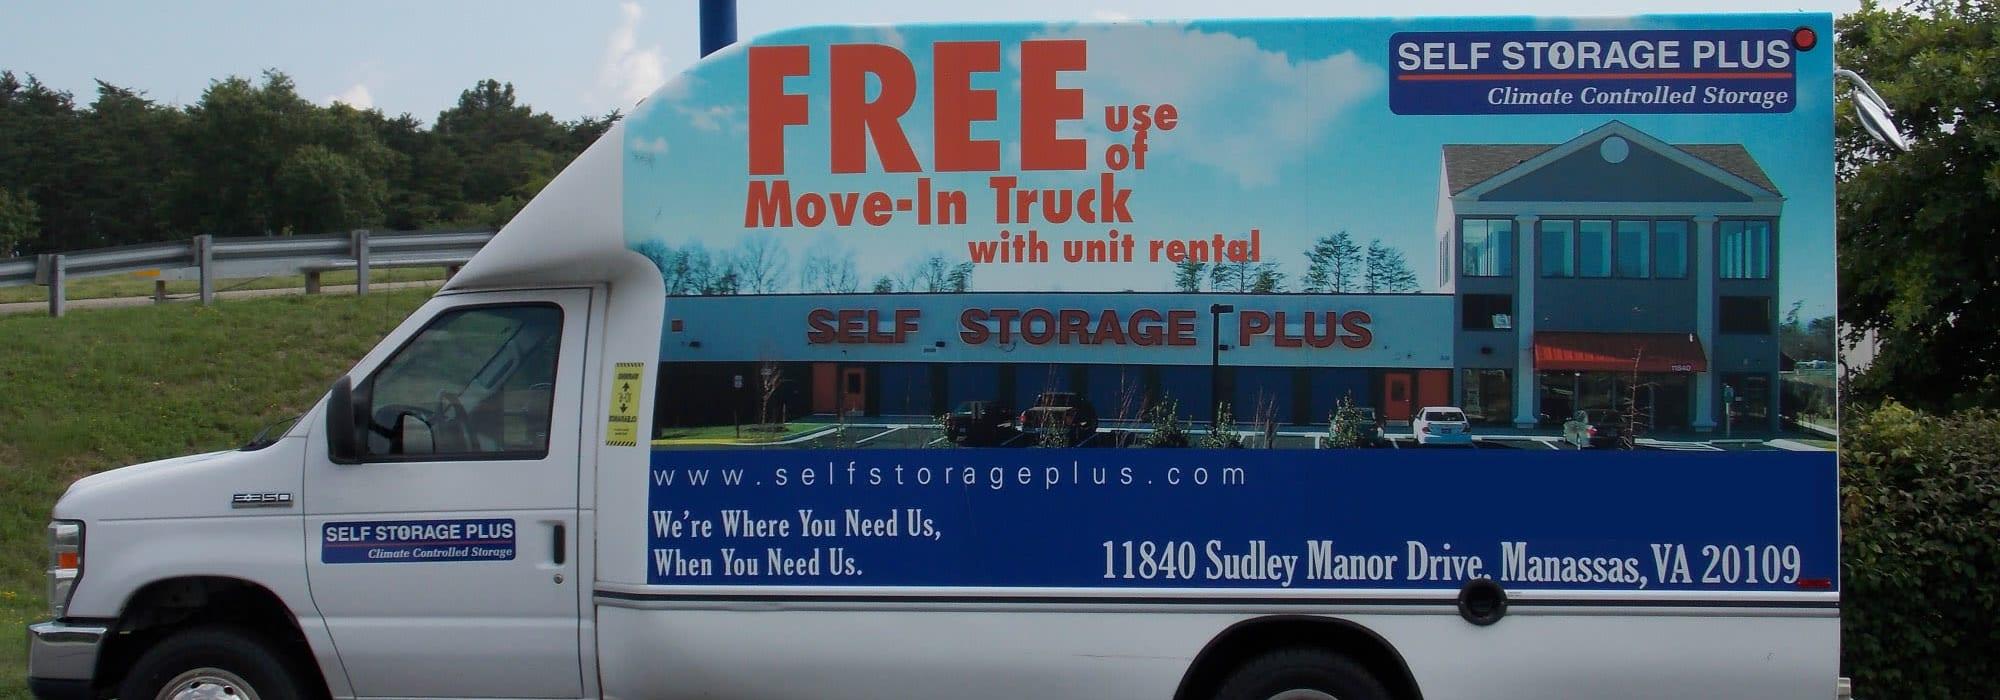 Self Storage Units Bull Run Manassas, VA | Self Storage Plus